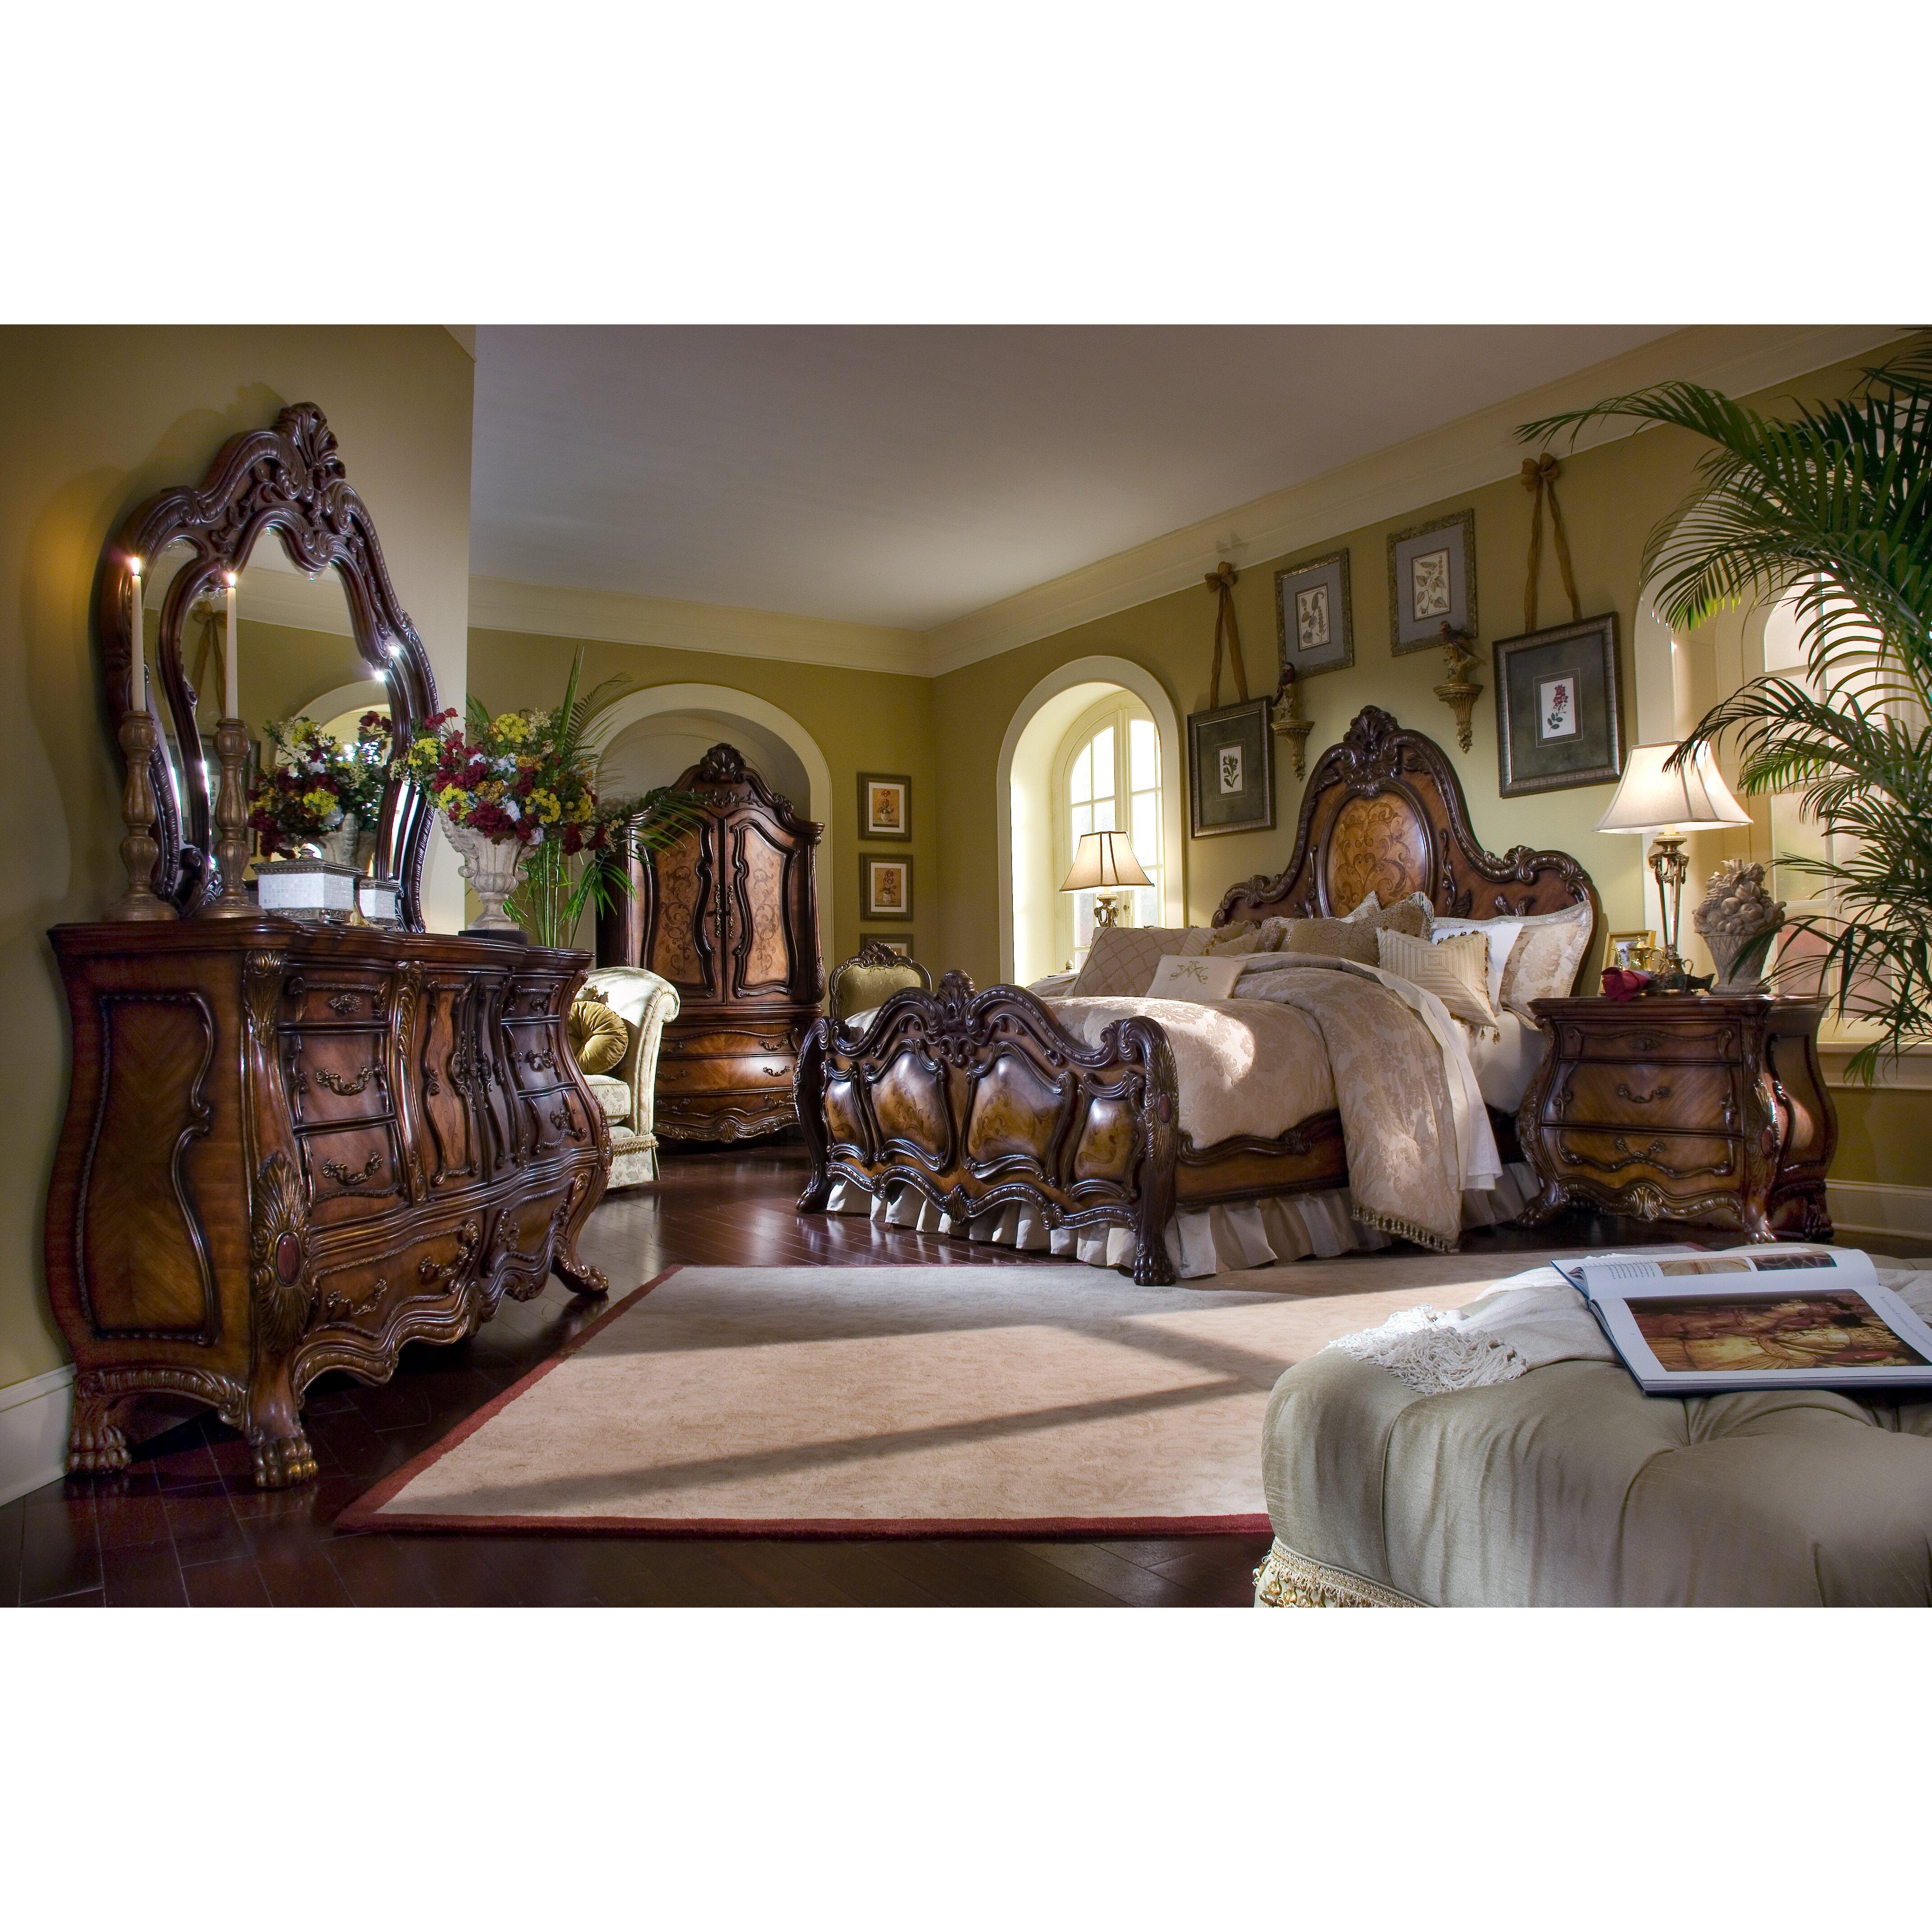 Michael amini chateau beauvais 3 drawer bachelor 39 s chest - Chateau beauvais living room furniture ...